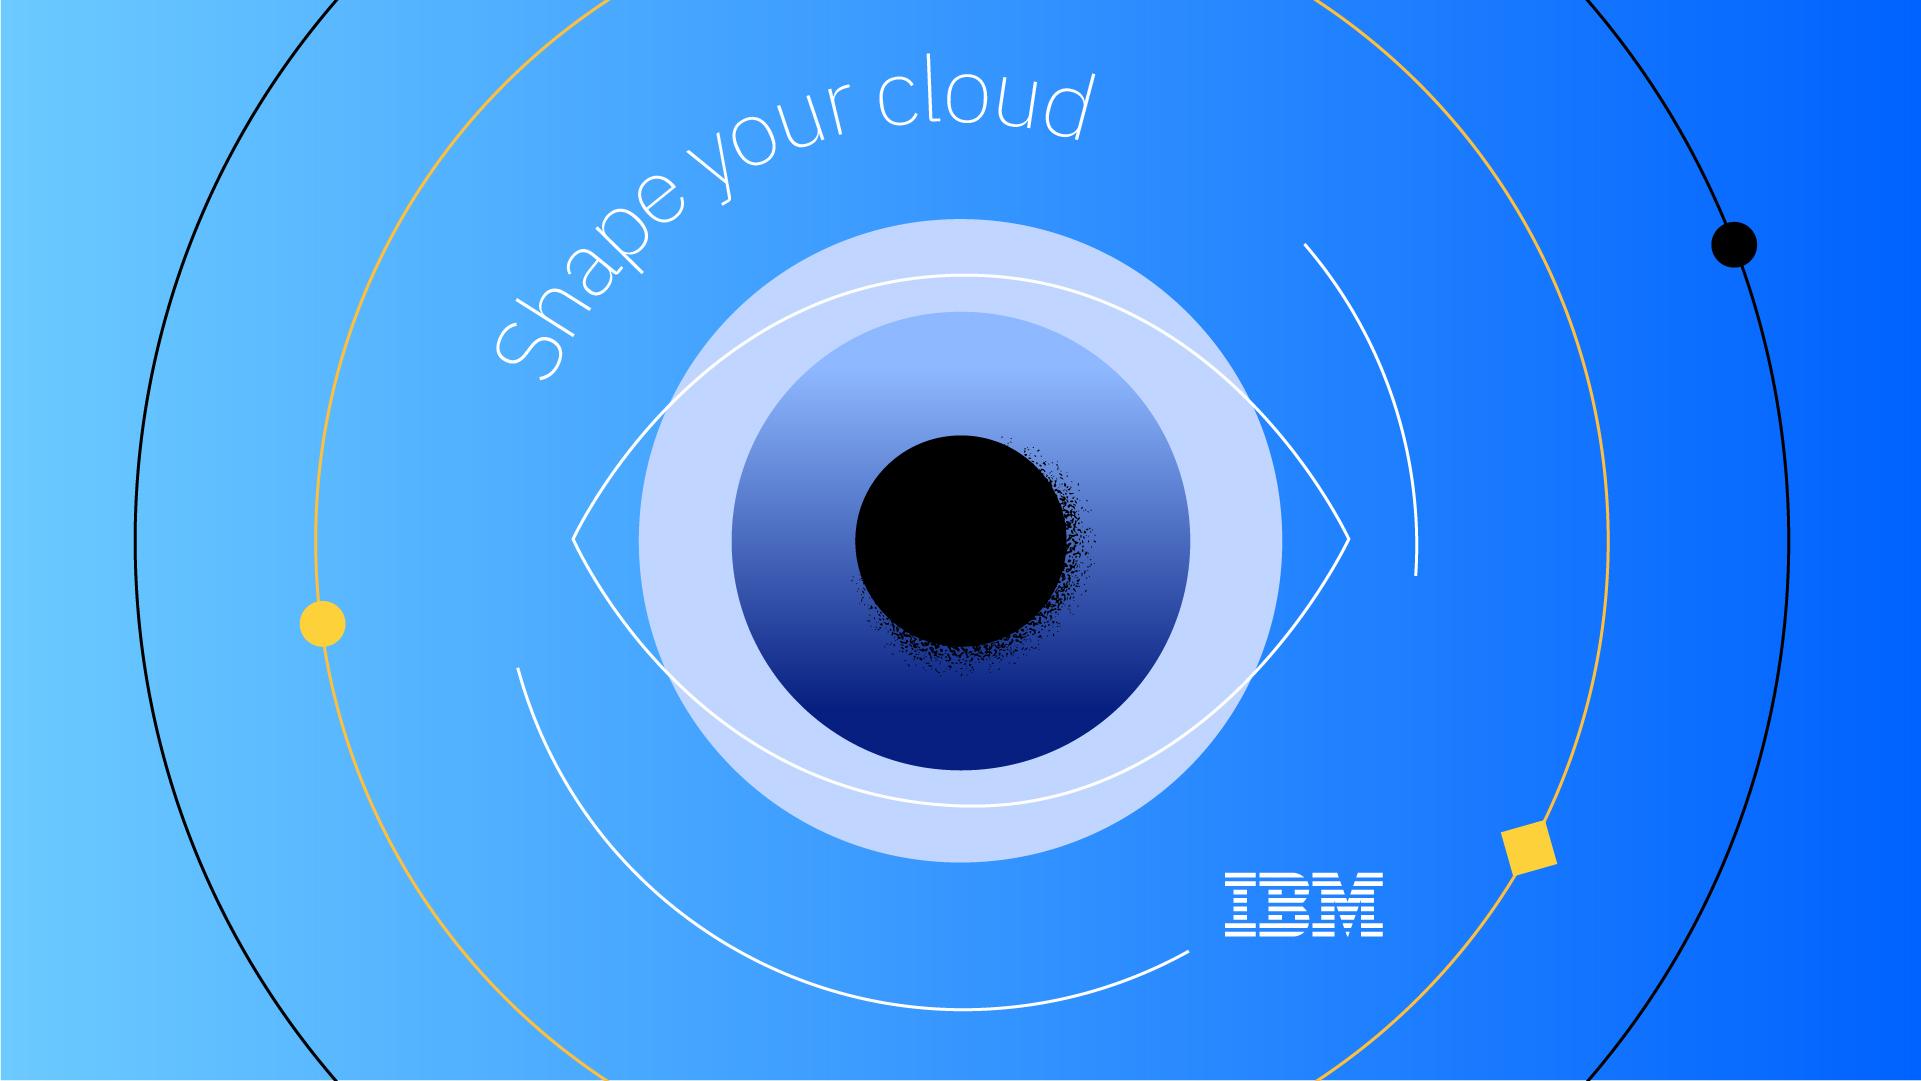 IBM_SHAPE-YOUR-CLOUD_DC_EDITS_BH_proceso_IBM-process-1.jpg